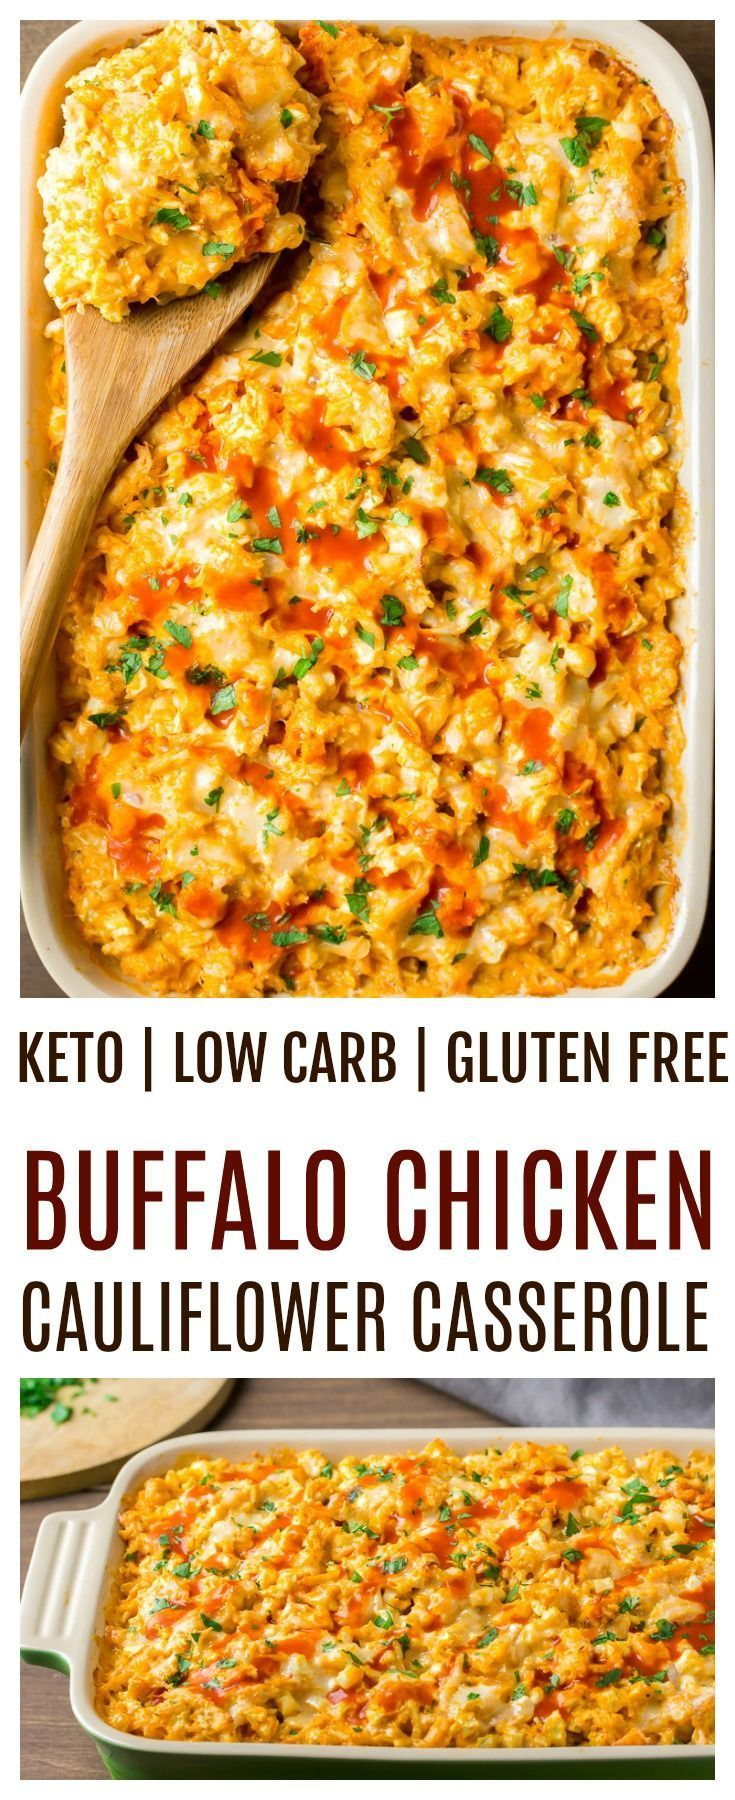 Creamy Buffalo Chicken Cauliflower Casserole - an easy recipe great for those on... - New Ideas #loadedcauliflowerbake